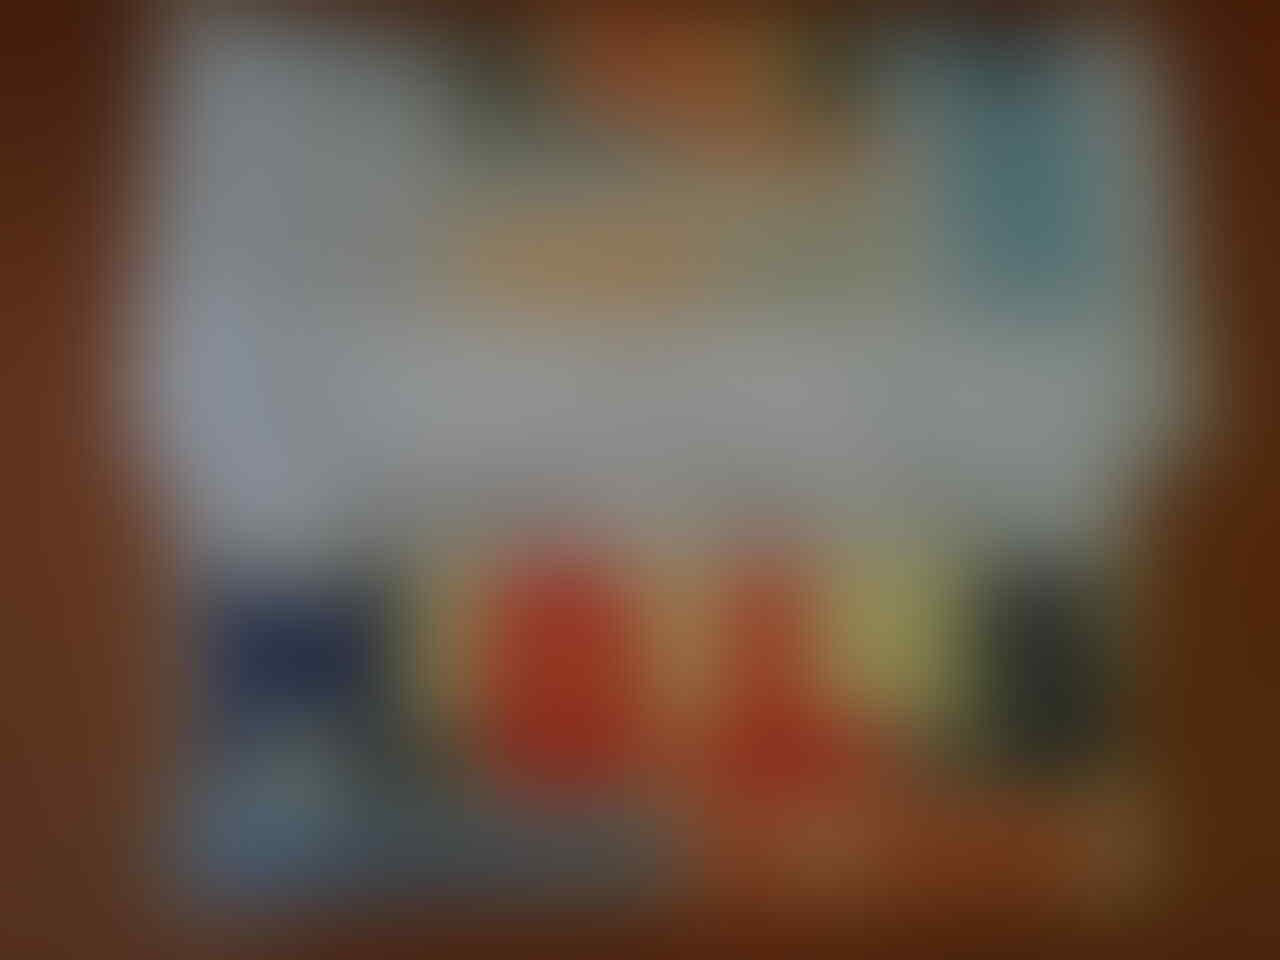 Tas Kecil-Sedang-Besar-Kantor Branded Kulit, Fredperry,MontBlanc,LV,Bally,DLL